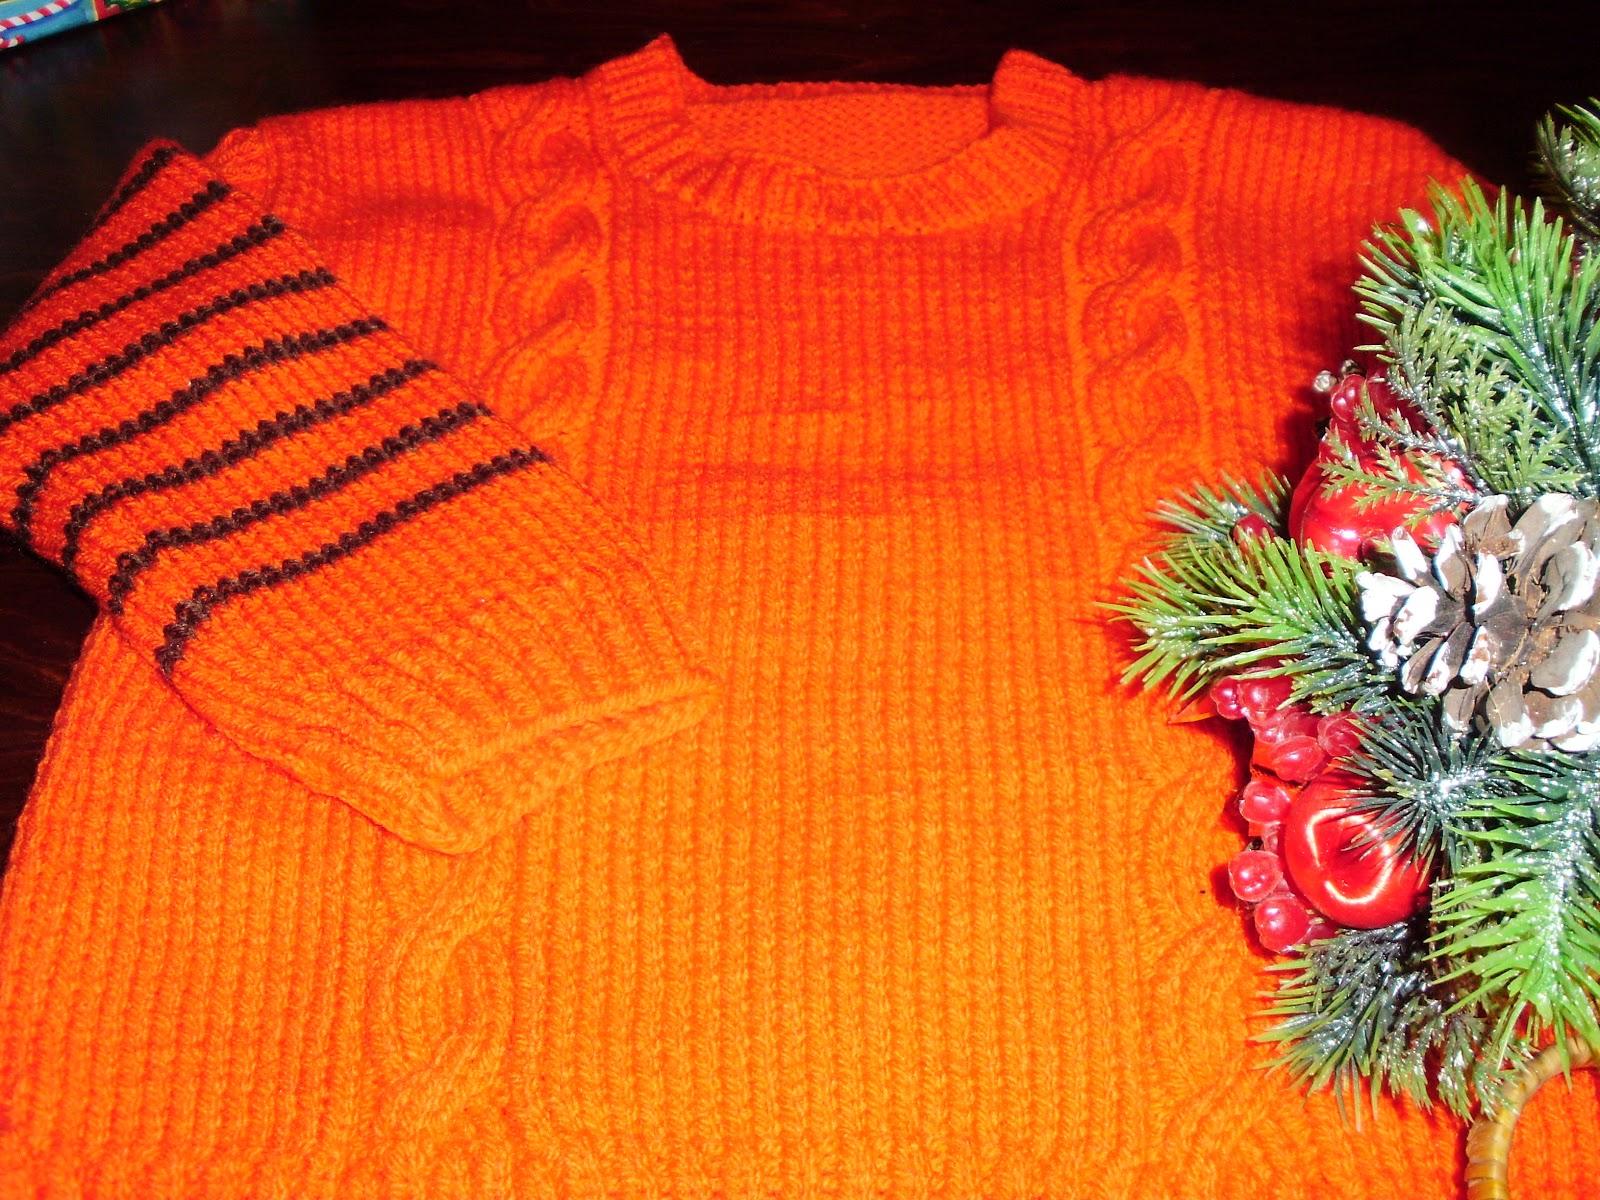 2ef3dcb3e2b Χειροποίητο παιδικό πλεκτό πουλοβεράκι με σχέδιο πλεξίδα, σε πορτοκαλί  χρώμα και ρίγες καφέ στο μανίκι - για κοριτσάκια